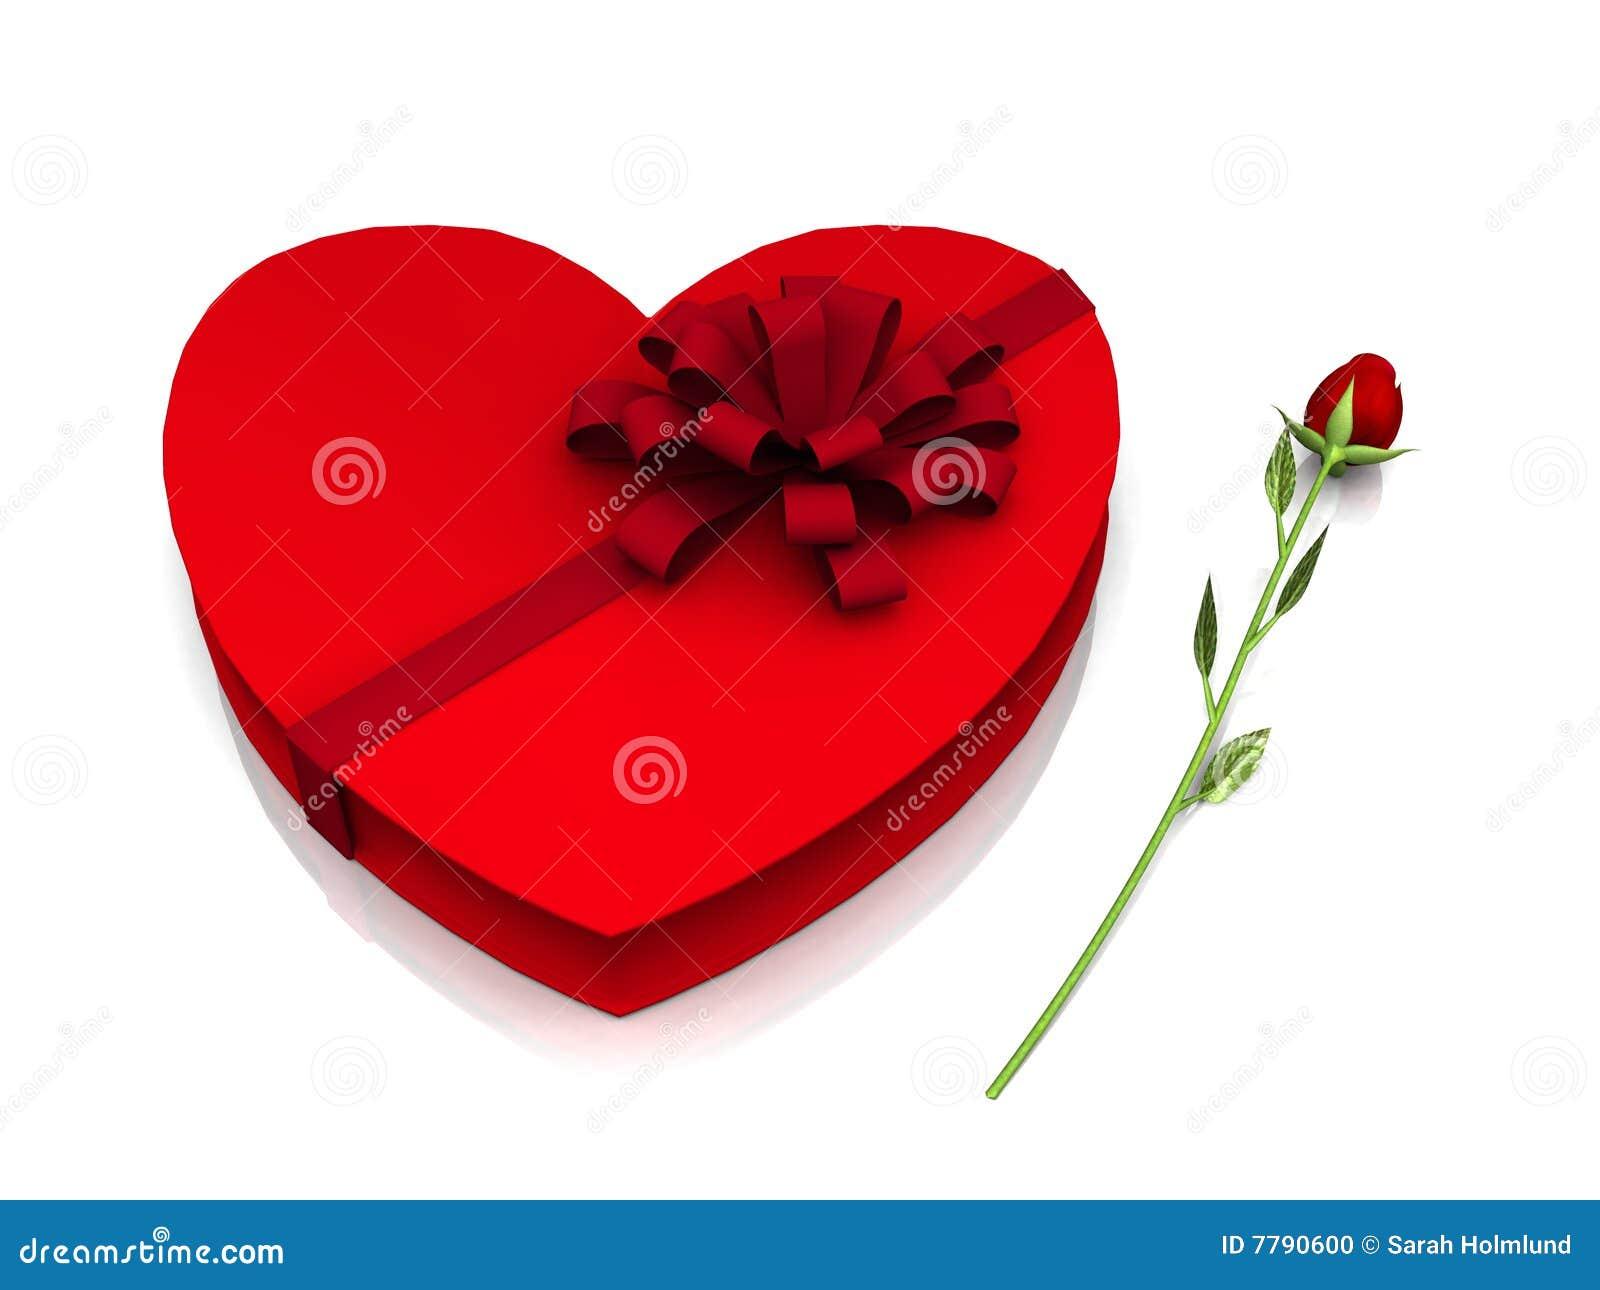 Valentine Gifts Stock Photo - Image: 7790600